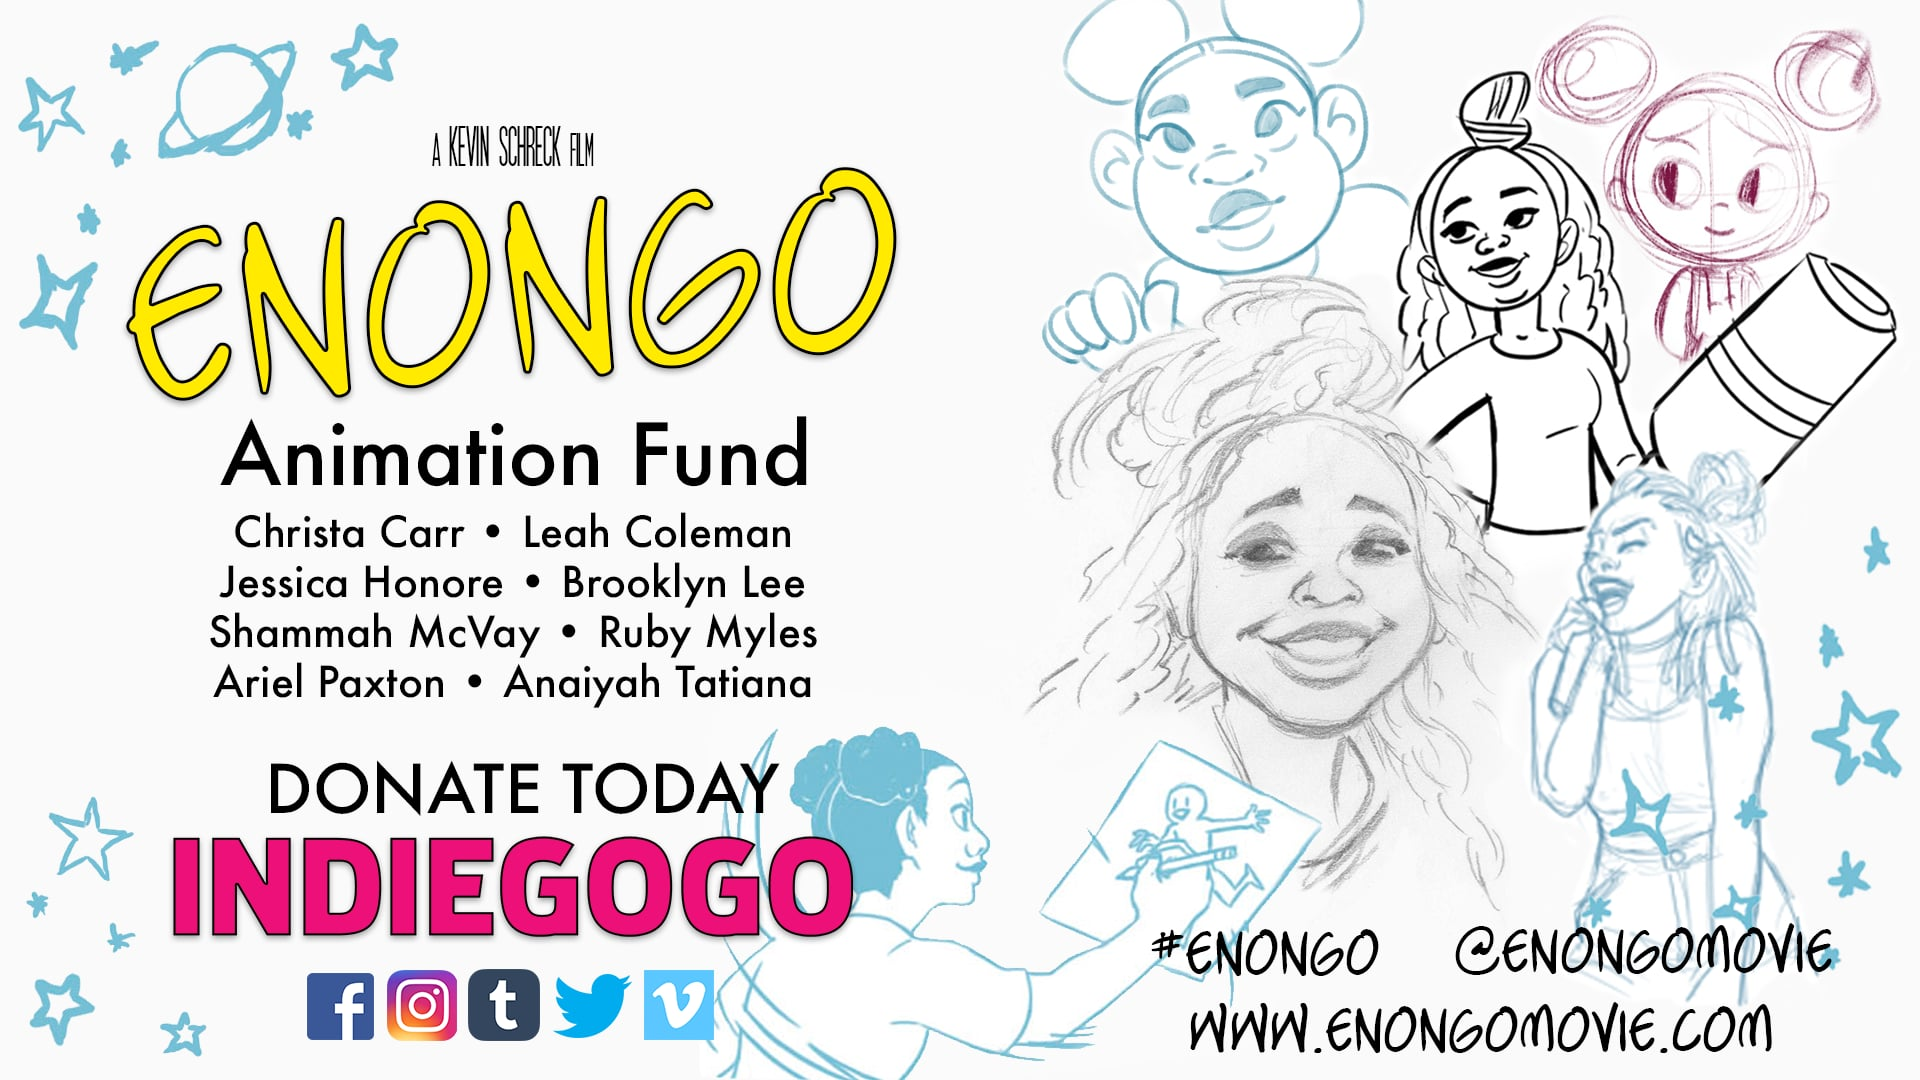 ENONGO - Animation Fund - Indiegogo Video